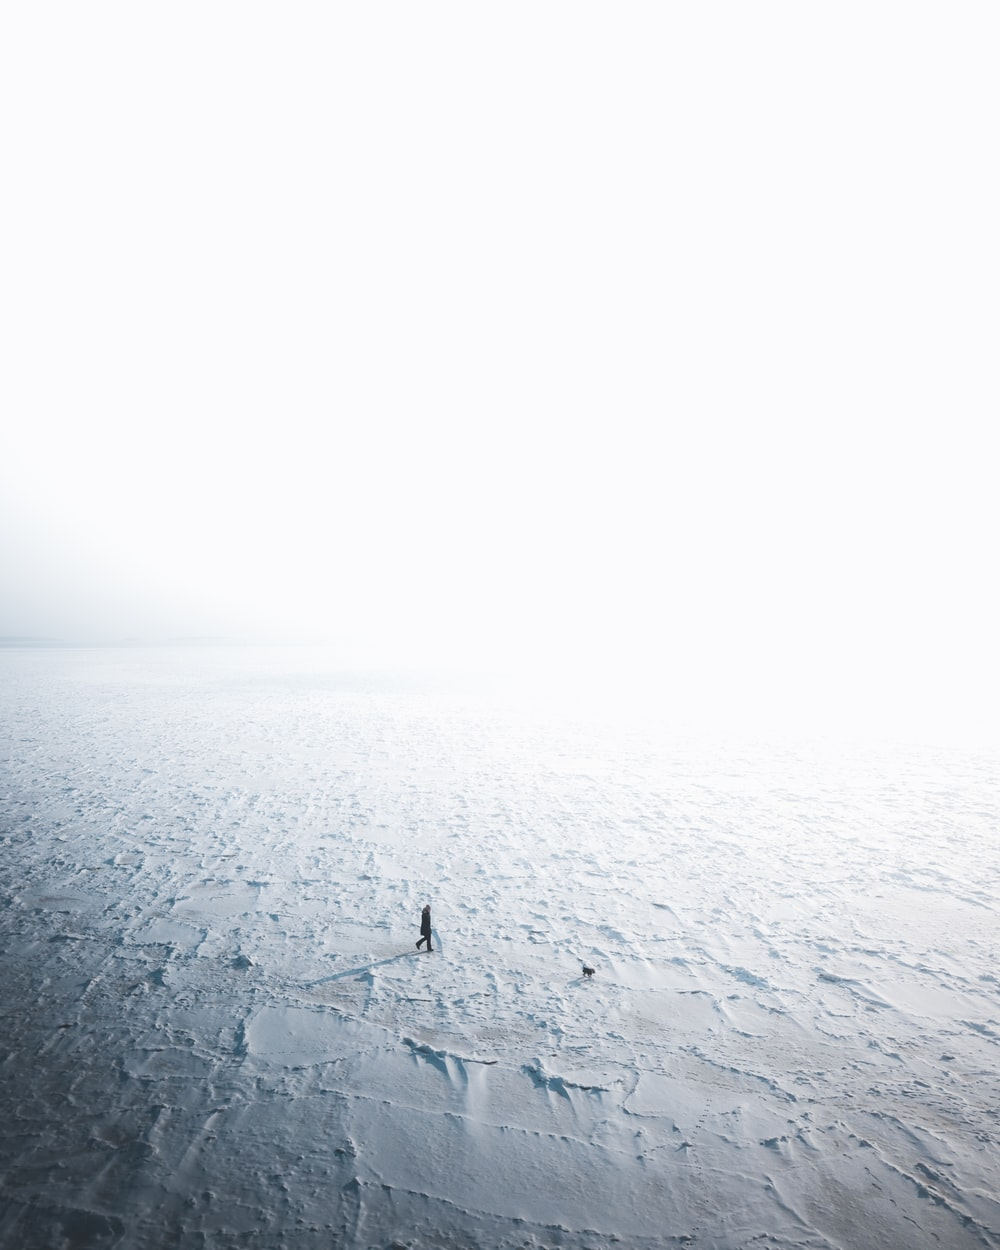 person on desert land during daytime